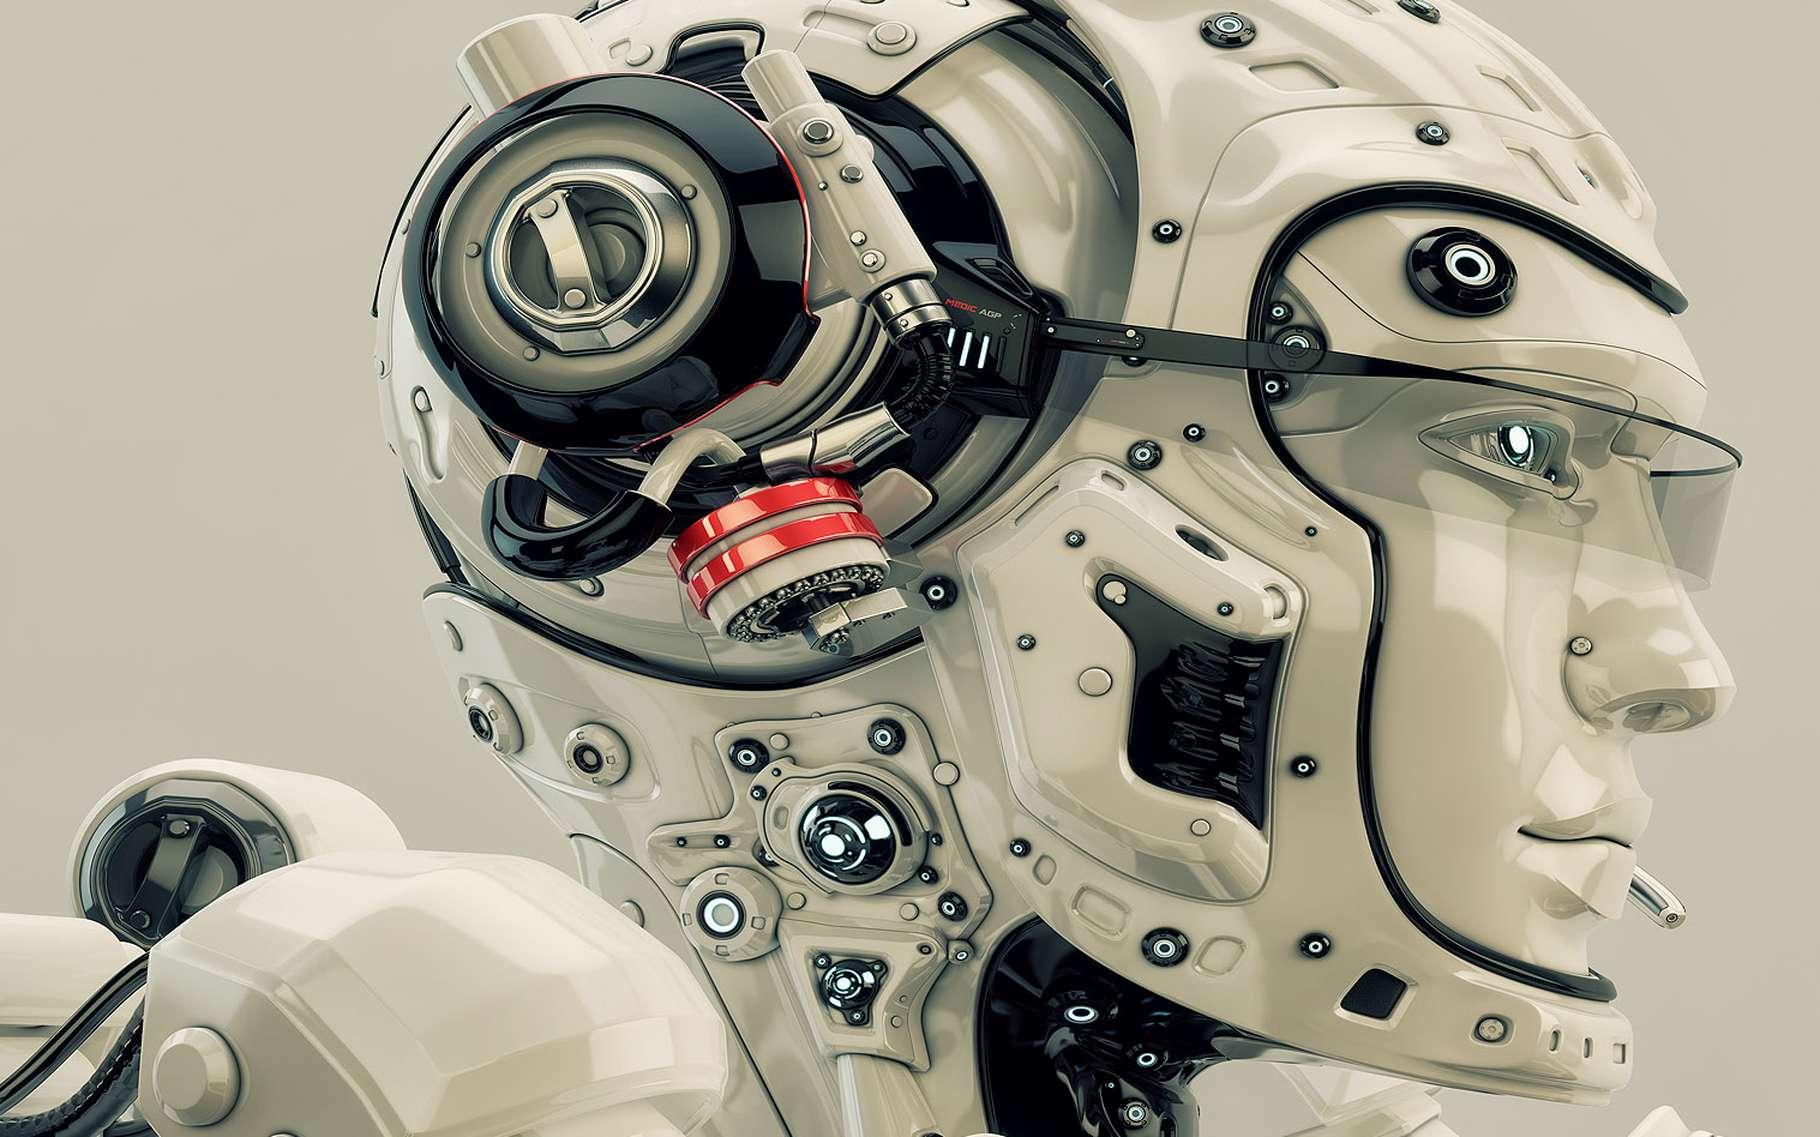 L'intelligence artificielle au service de la santé ? © Ociacia, Shutterstock